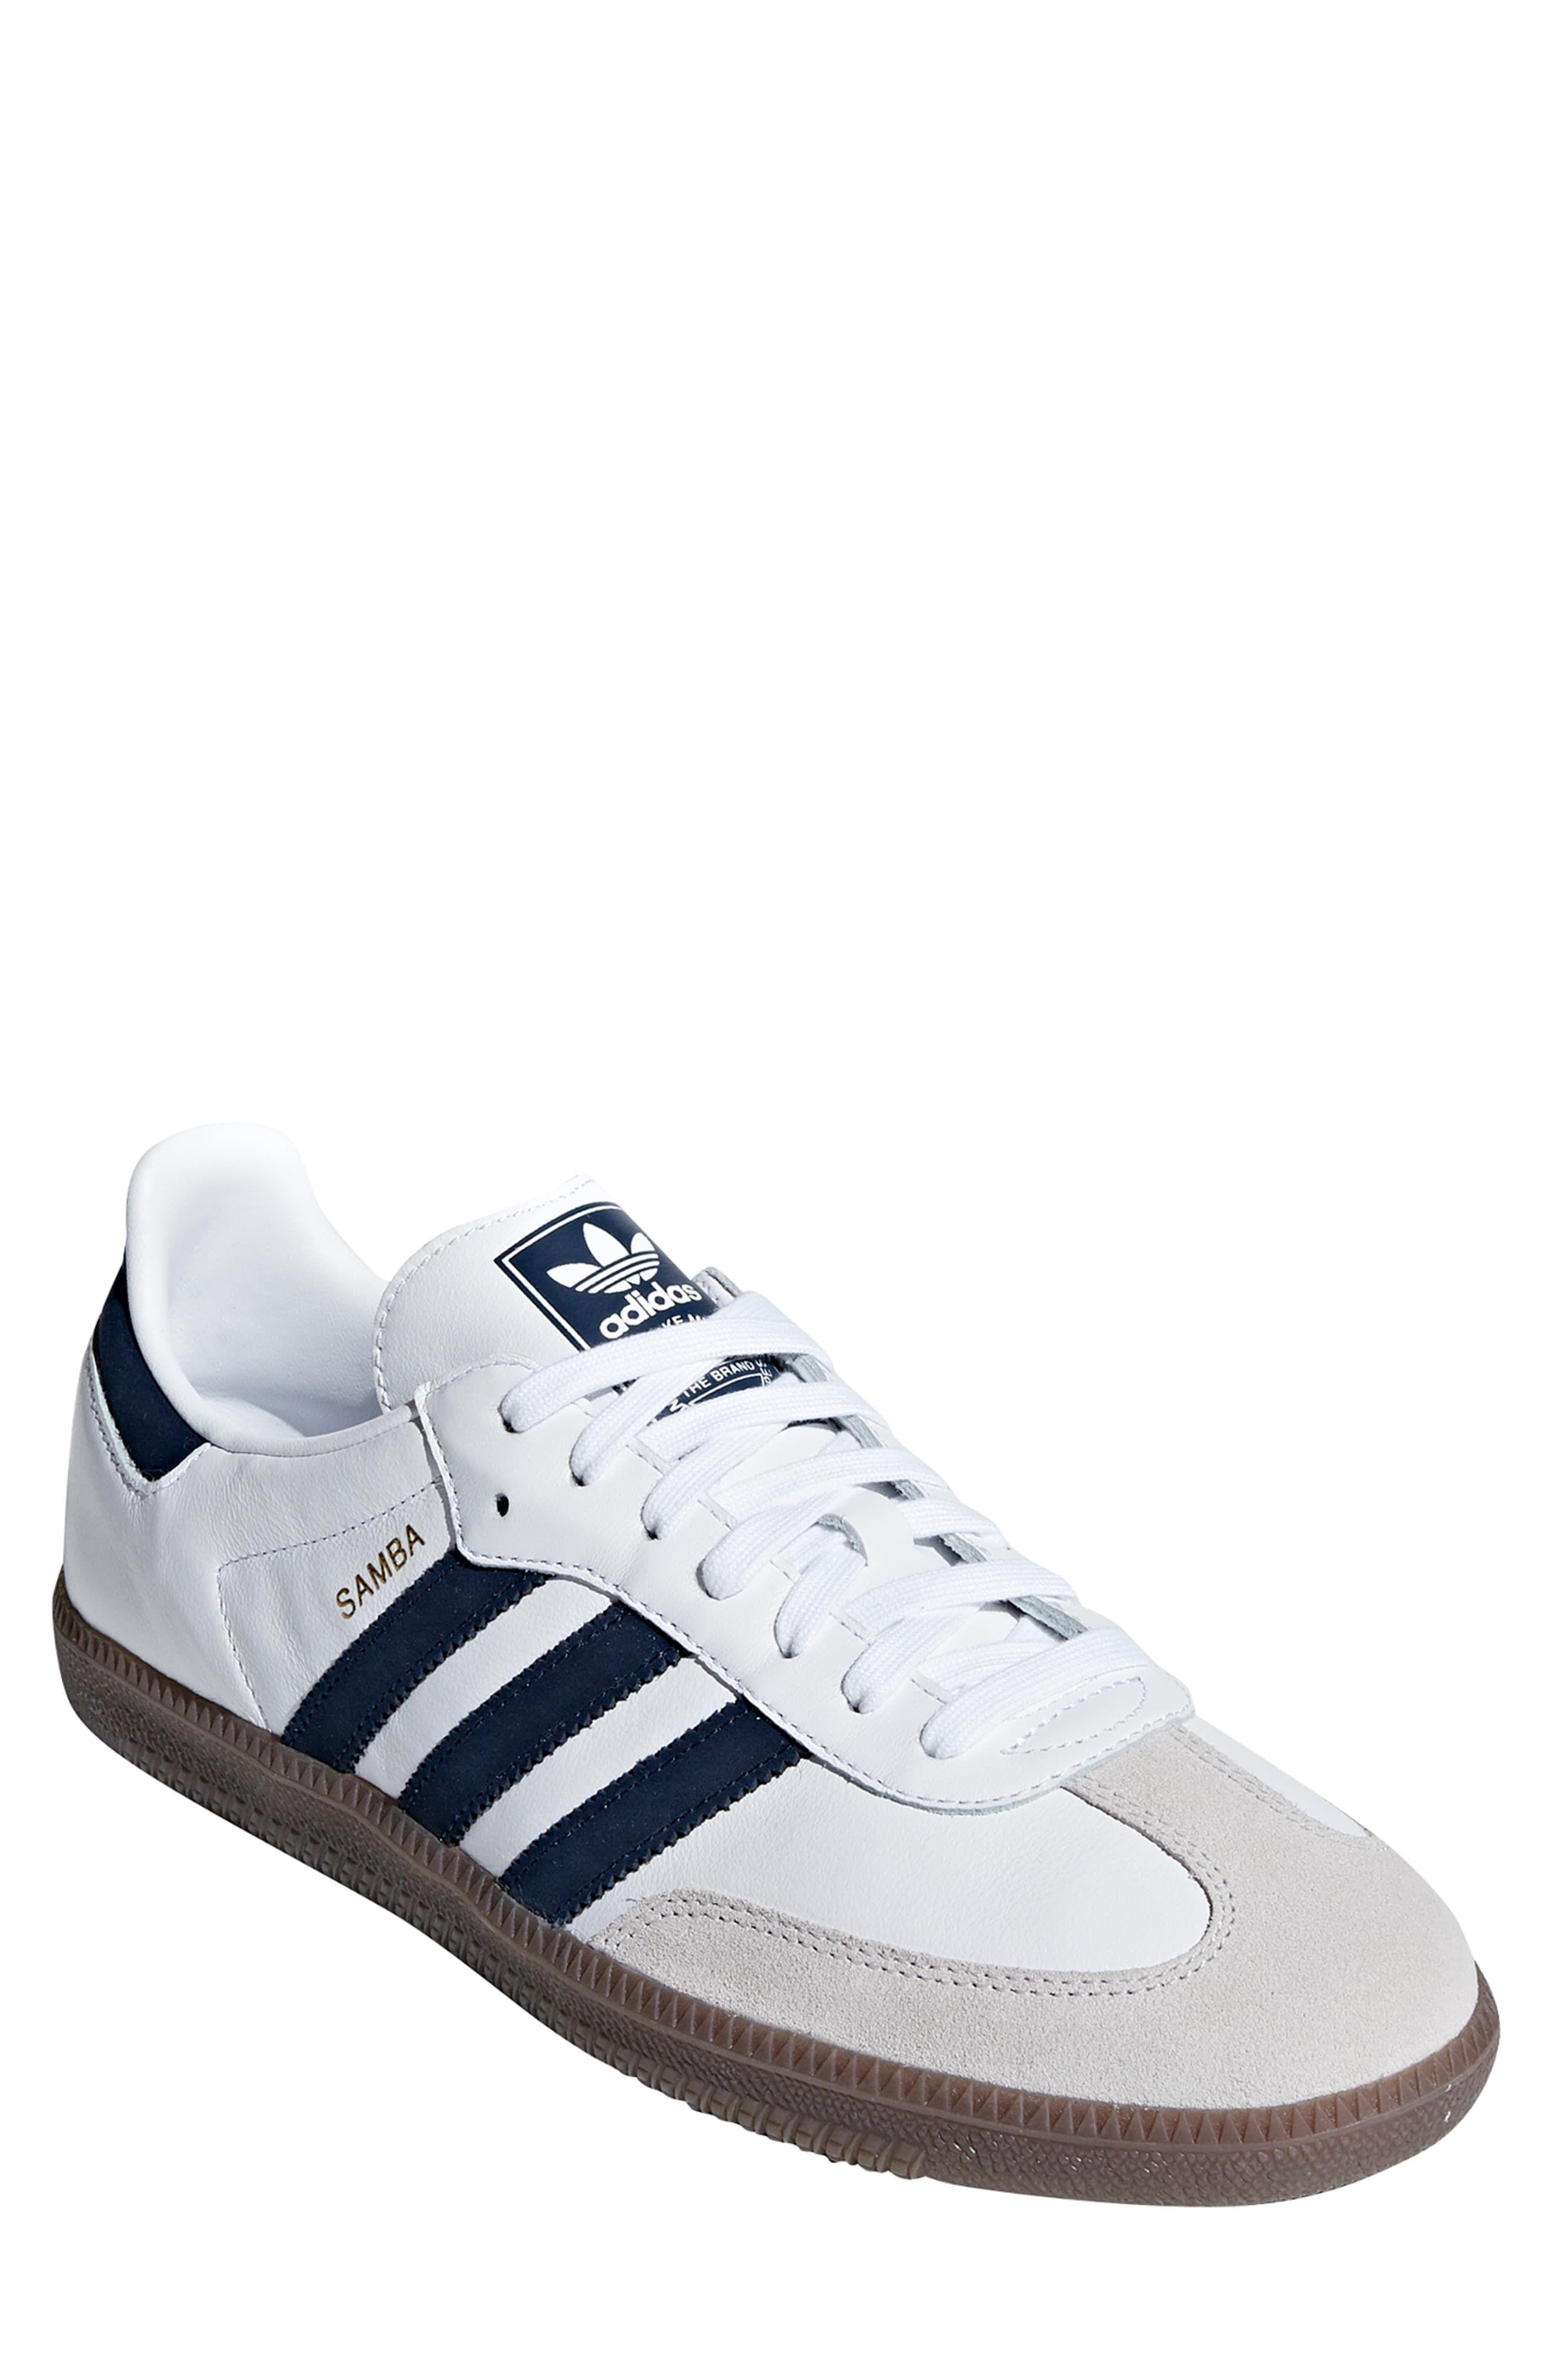 adidas Samba Sneaker (Women | Adidas samba, Adidas men, Sneakers